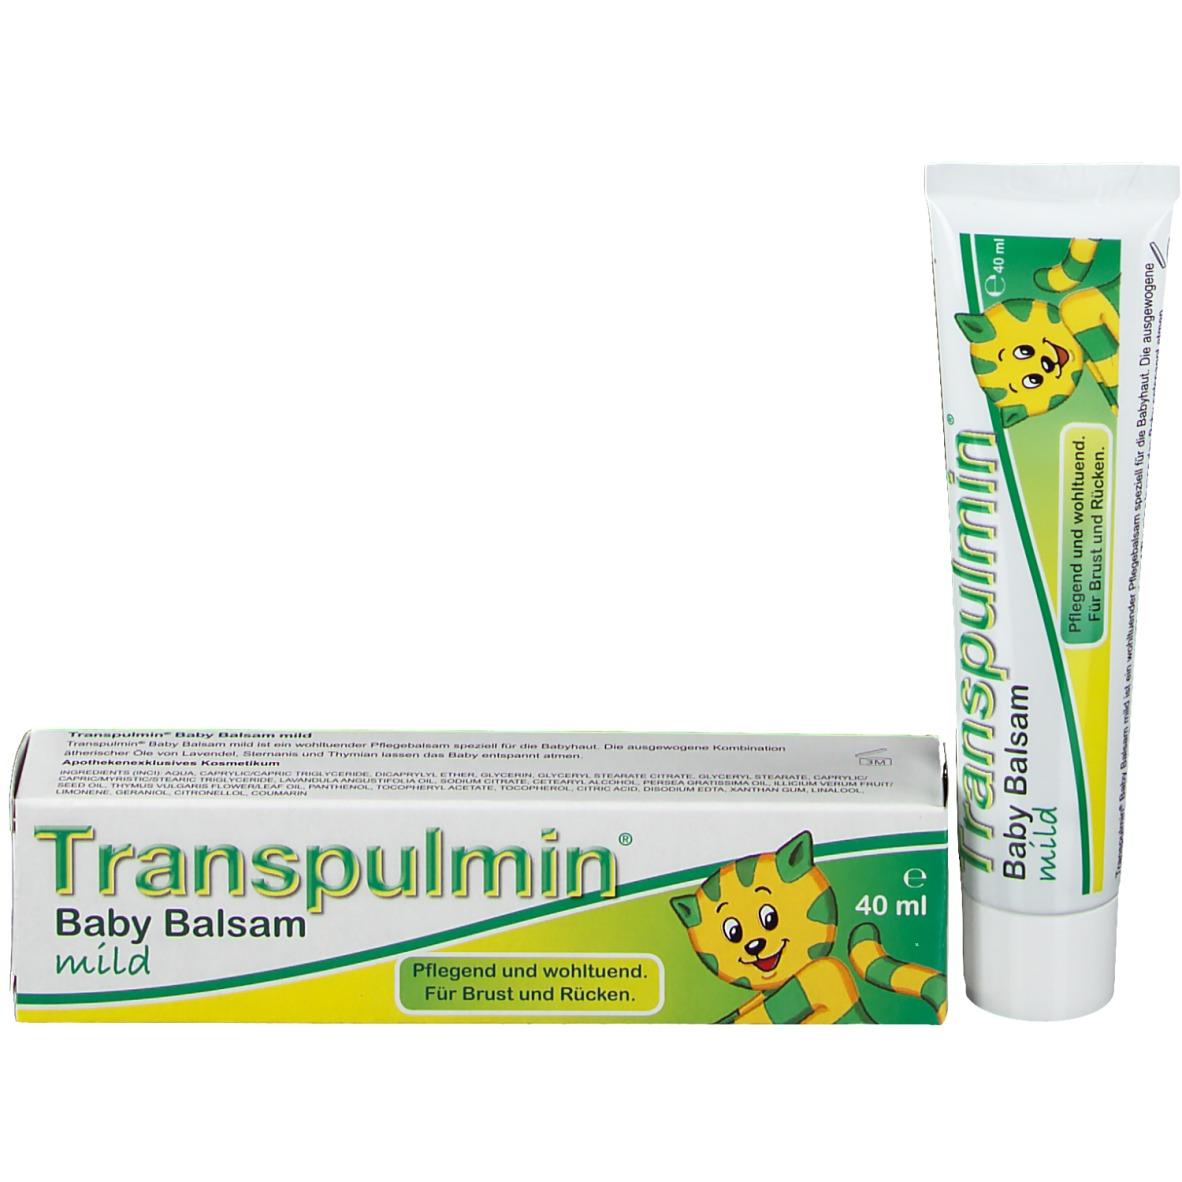 Transpulmin® Baby Balsam mild - shop-apotheke.ch